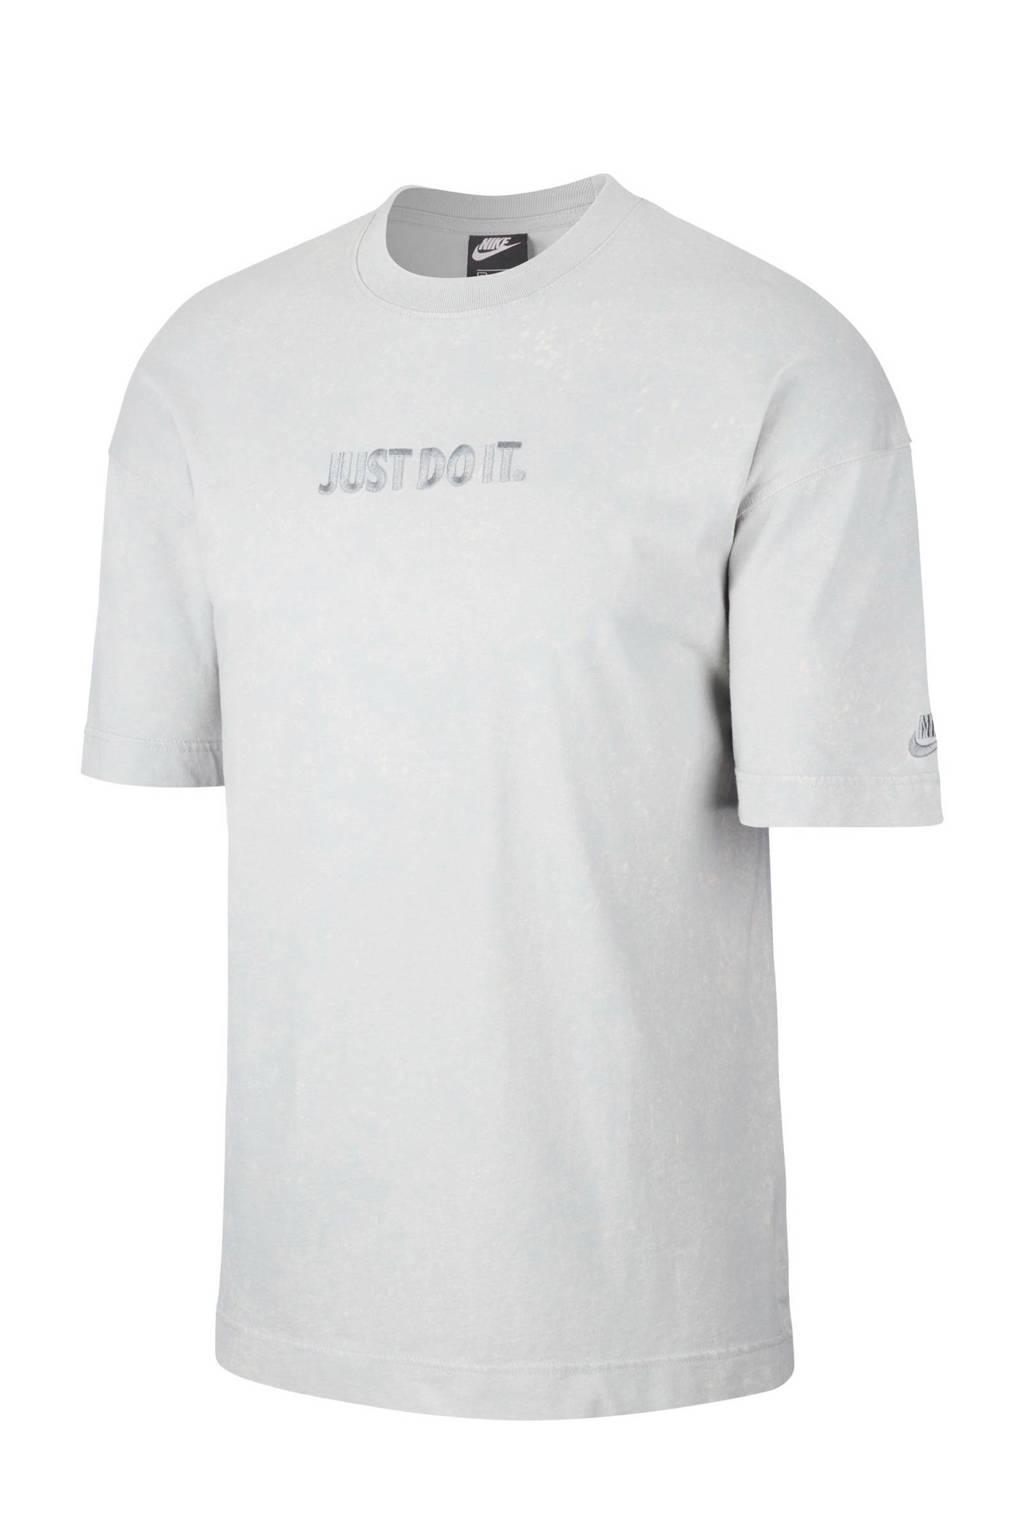 Nike   T-shirt lichtgrijs, Lichtgrijs